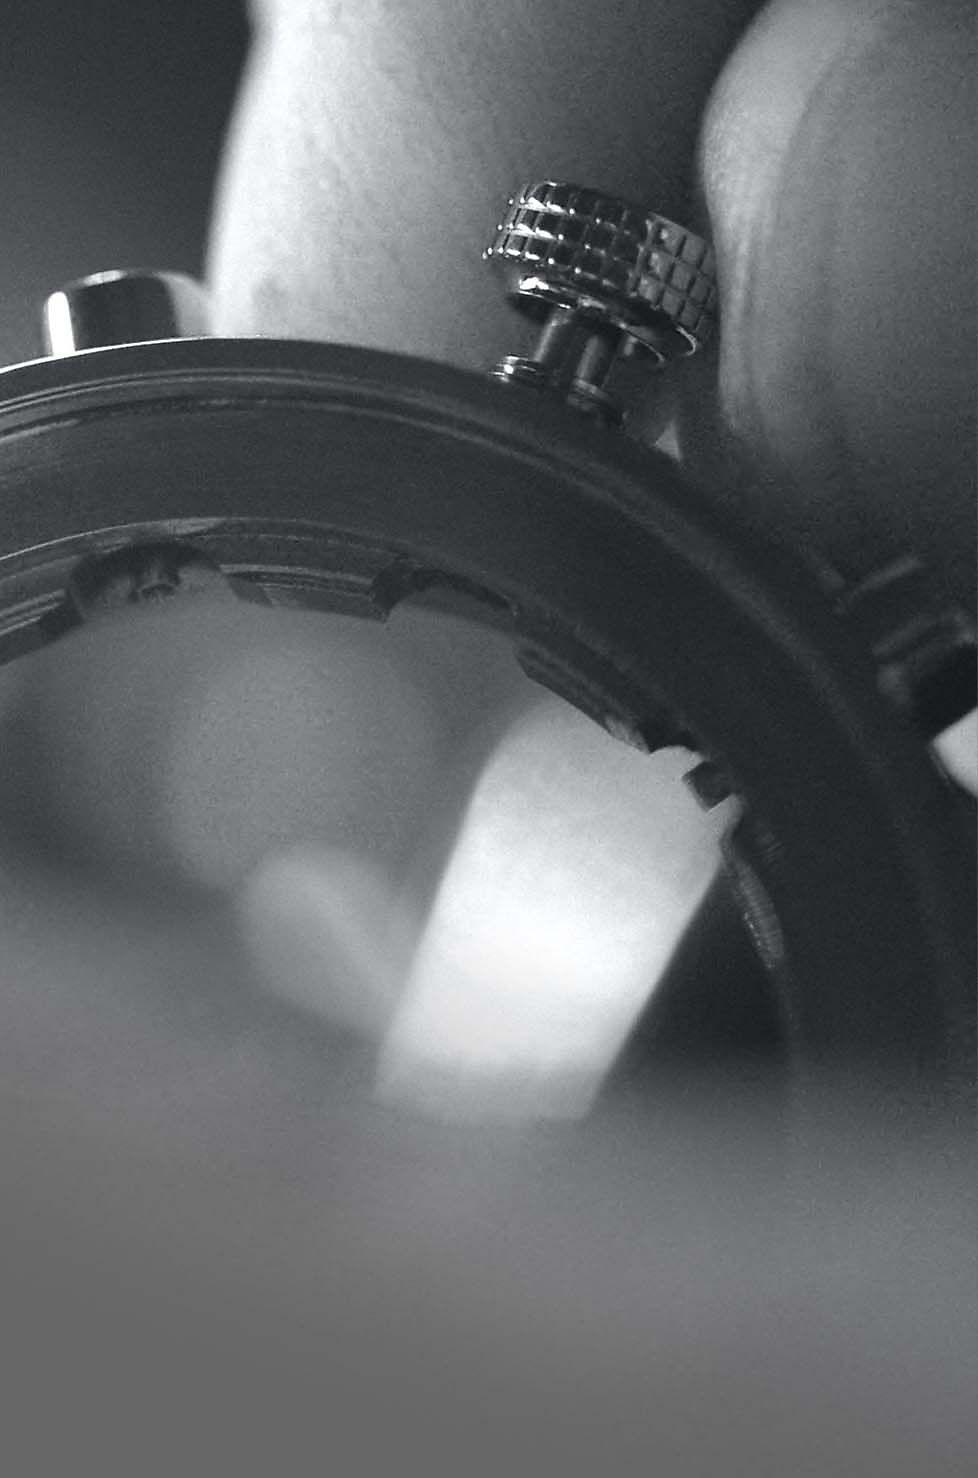 Tiffany Swiss Watches Craftsmanship